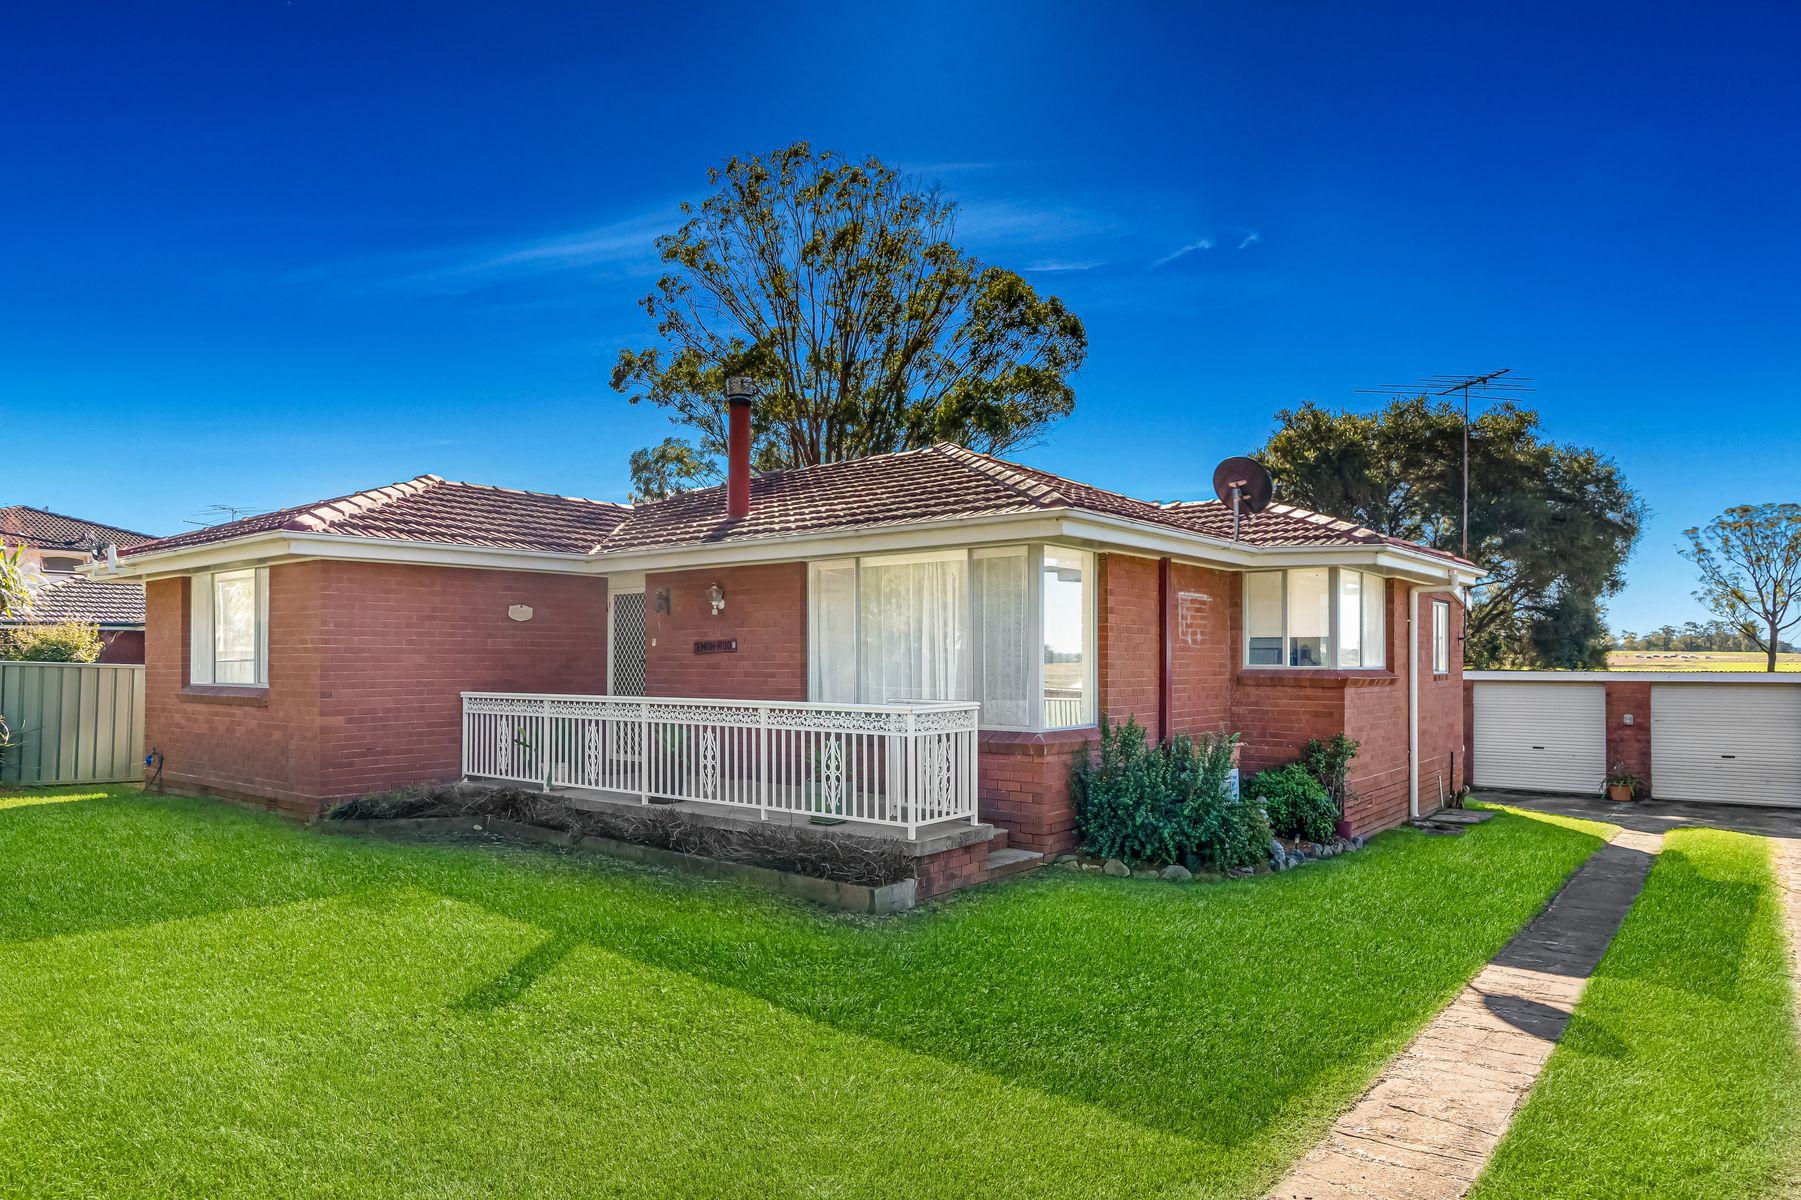 389 Terrace Road, North Richmond, NSW 2754